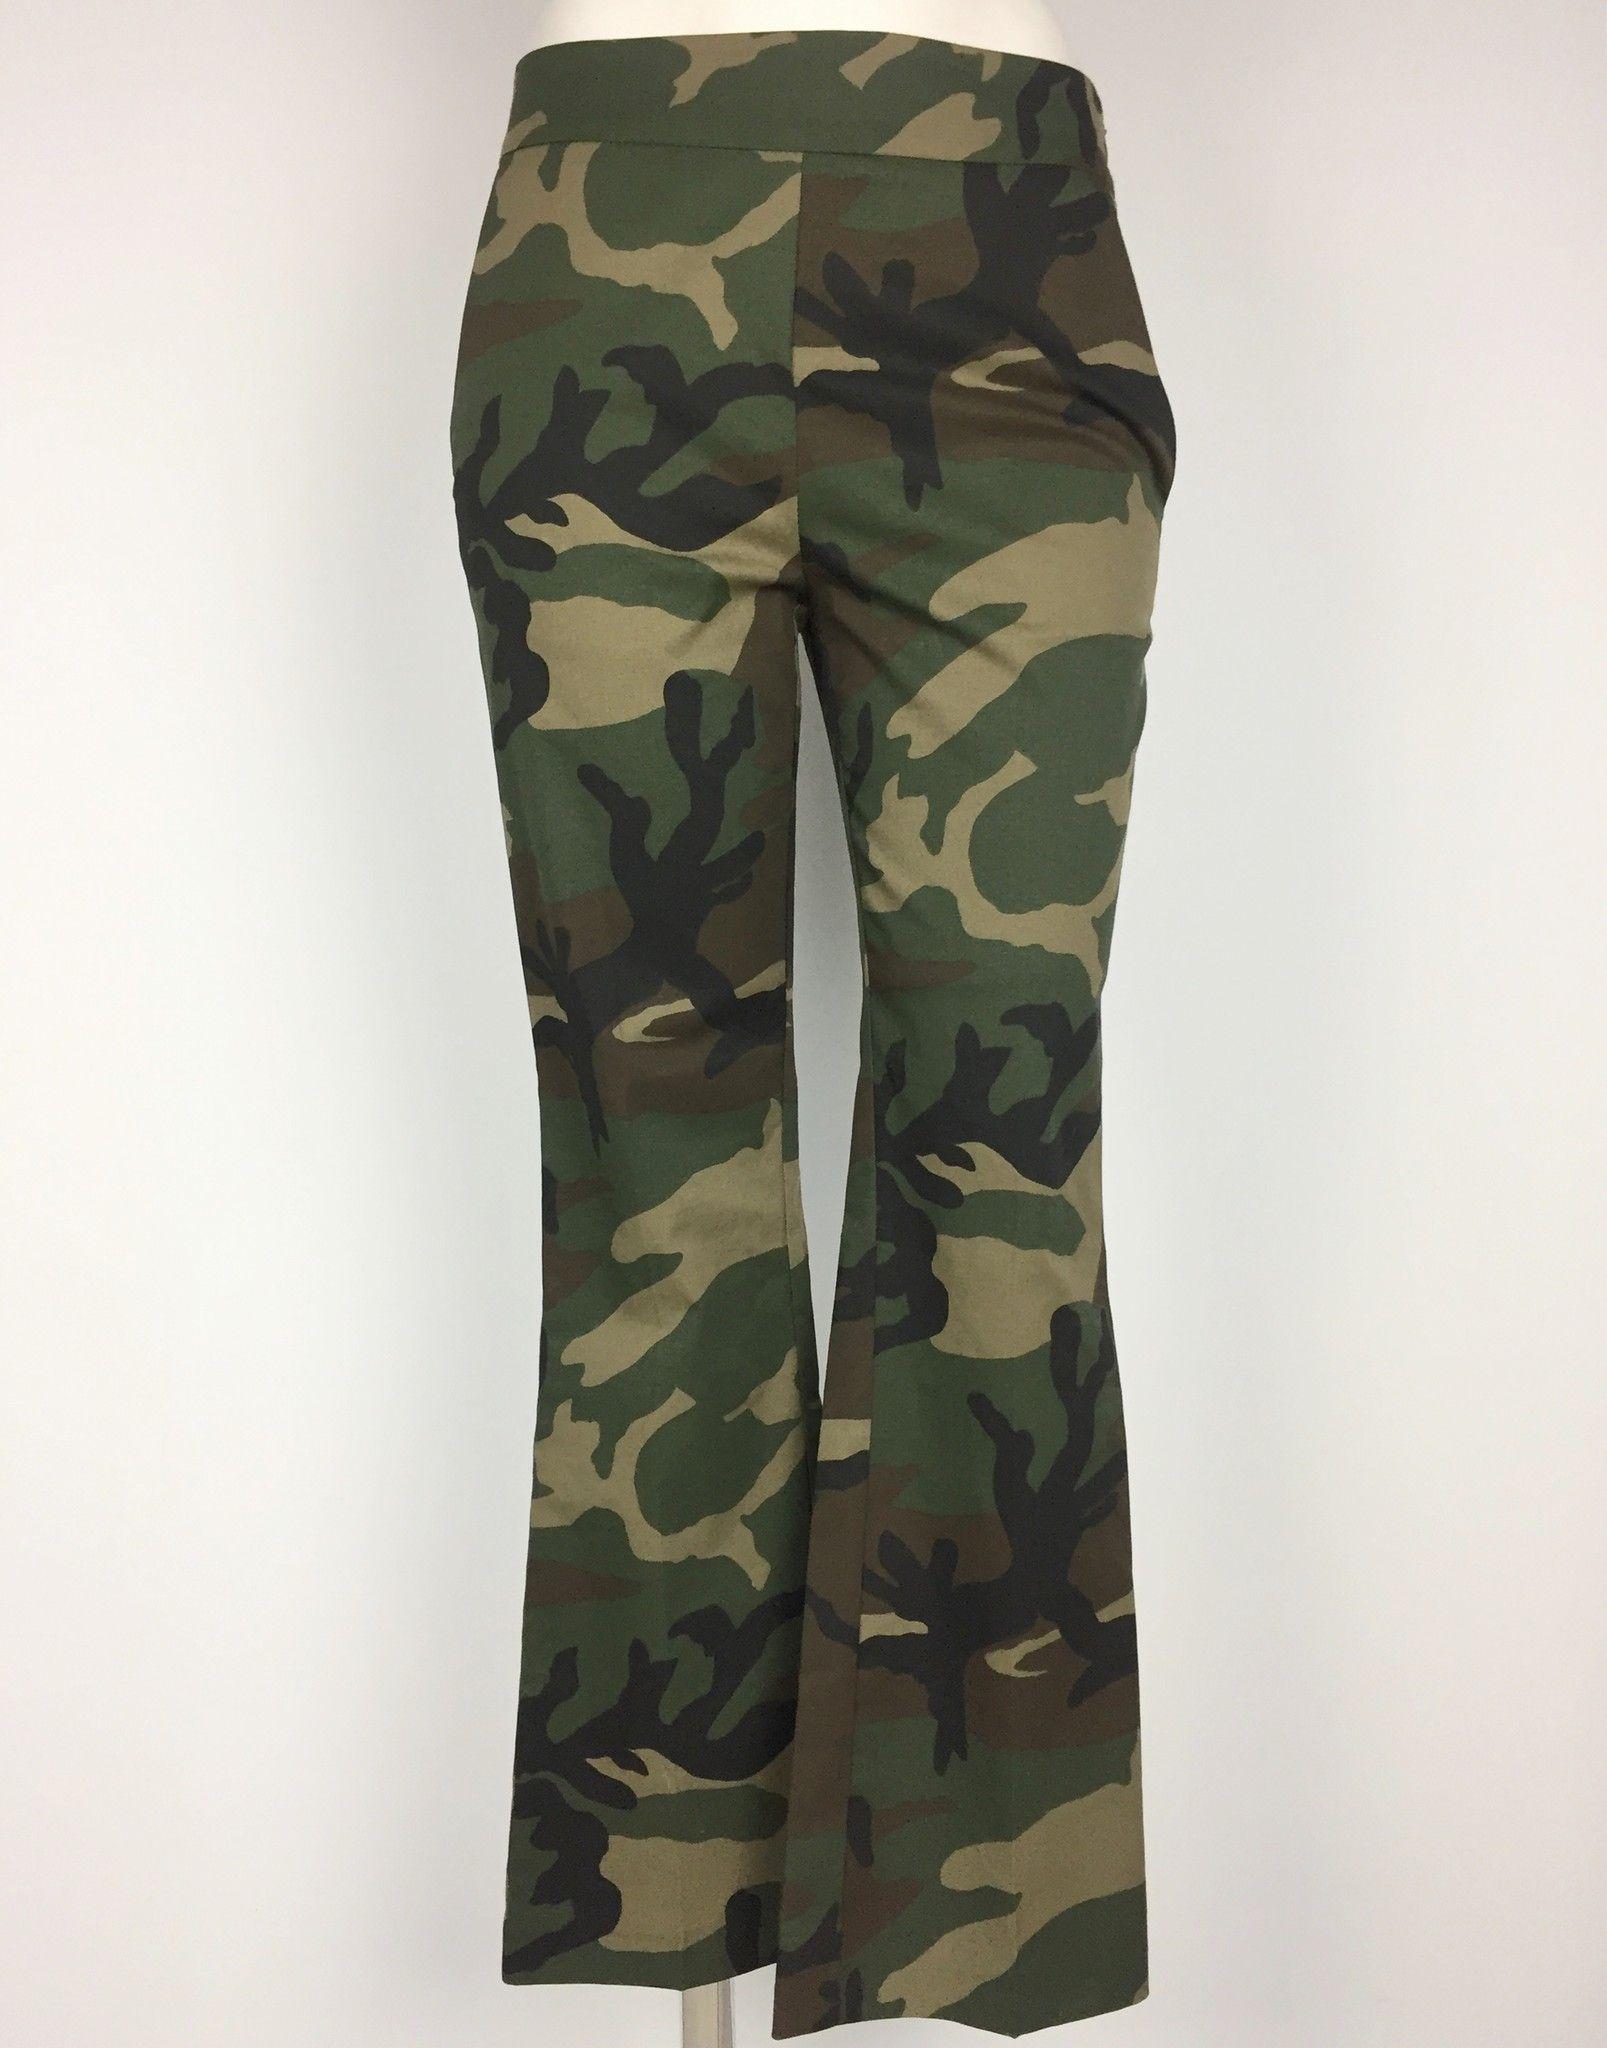 Pantalone LadyBug a Caviglia Fant.Camouflage Cod.T1641